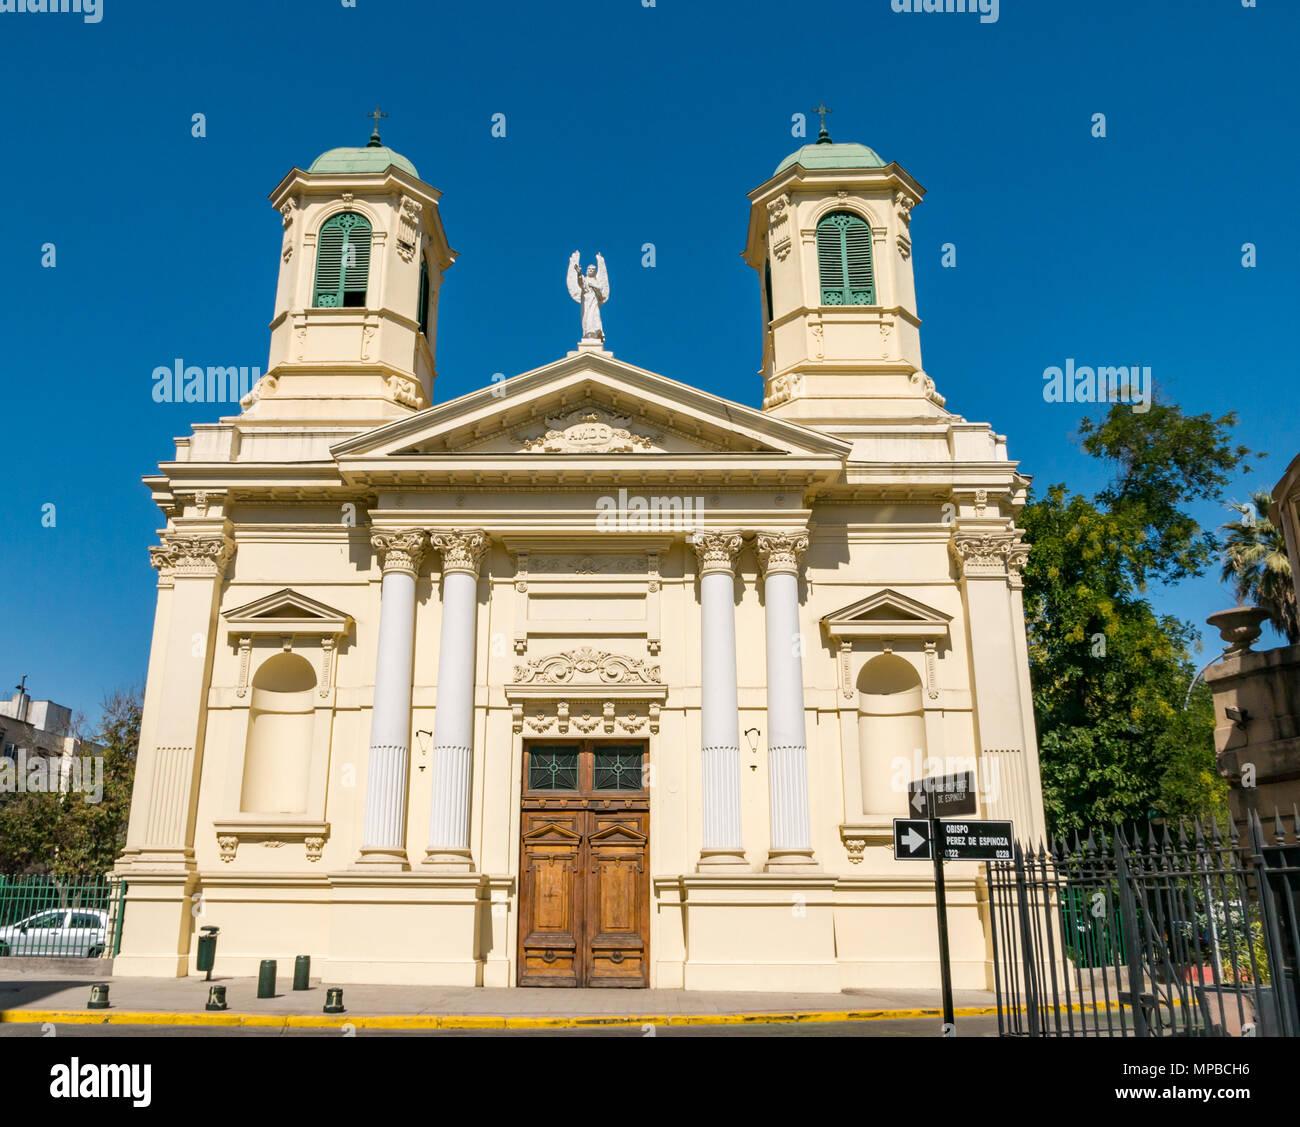 Historic yellow Holy Guardian Angels parish Catholic church